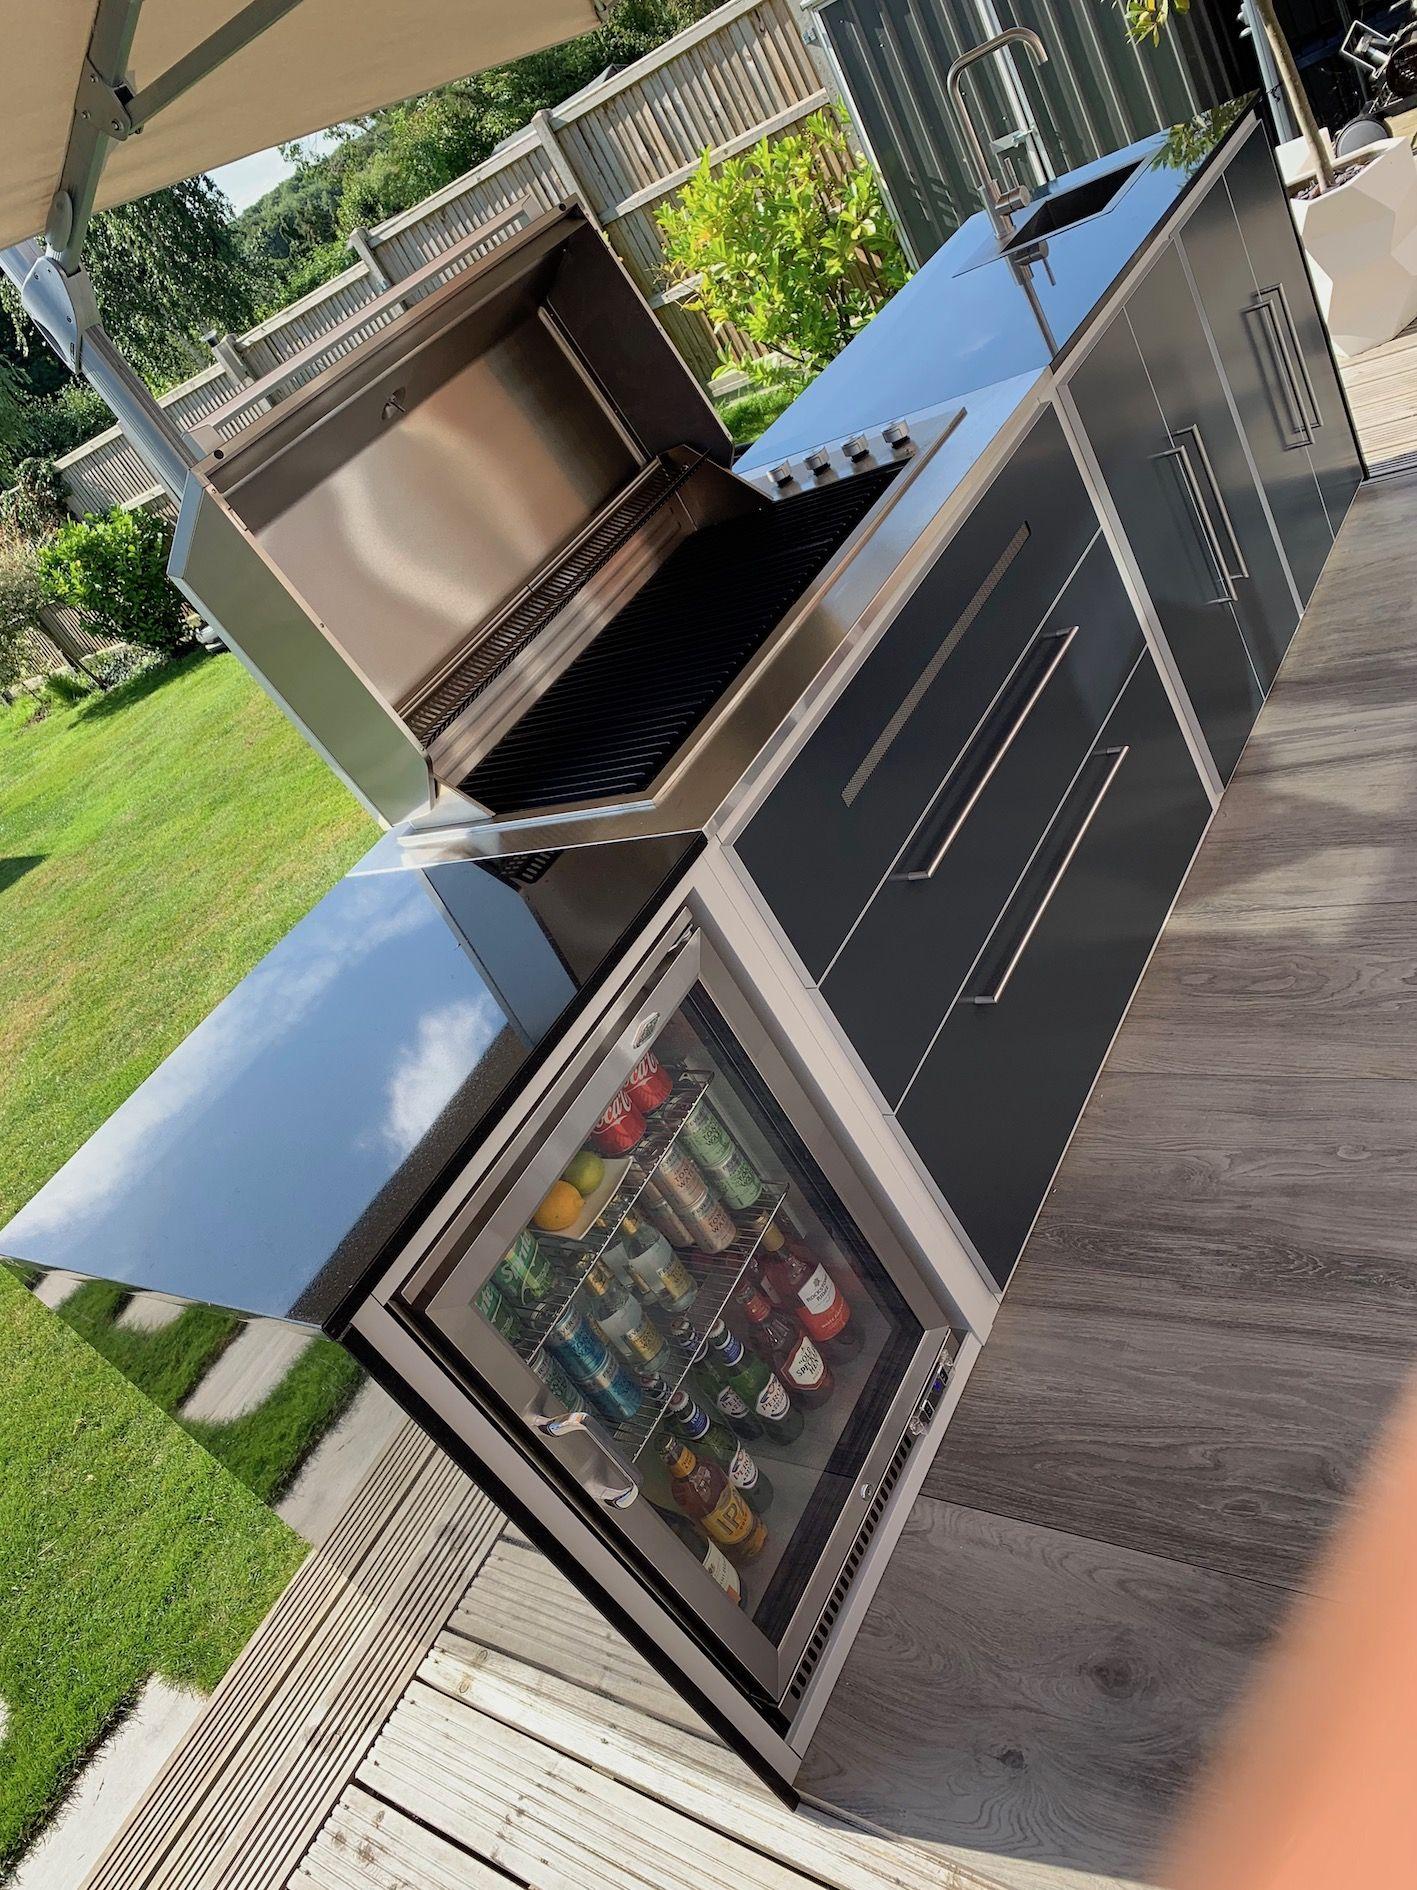 Alfresco Outdoor Kitchen Outdoor kitchen, Modular